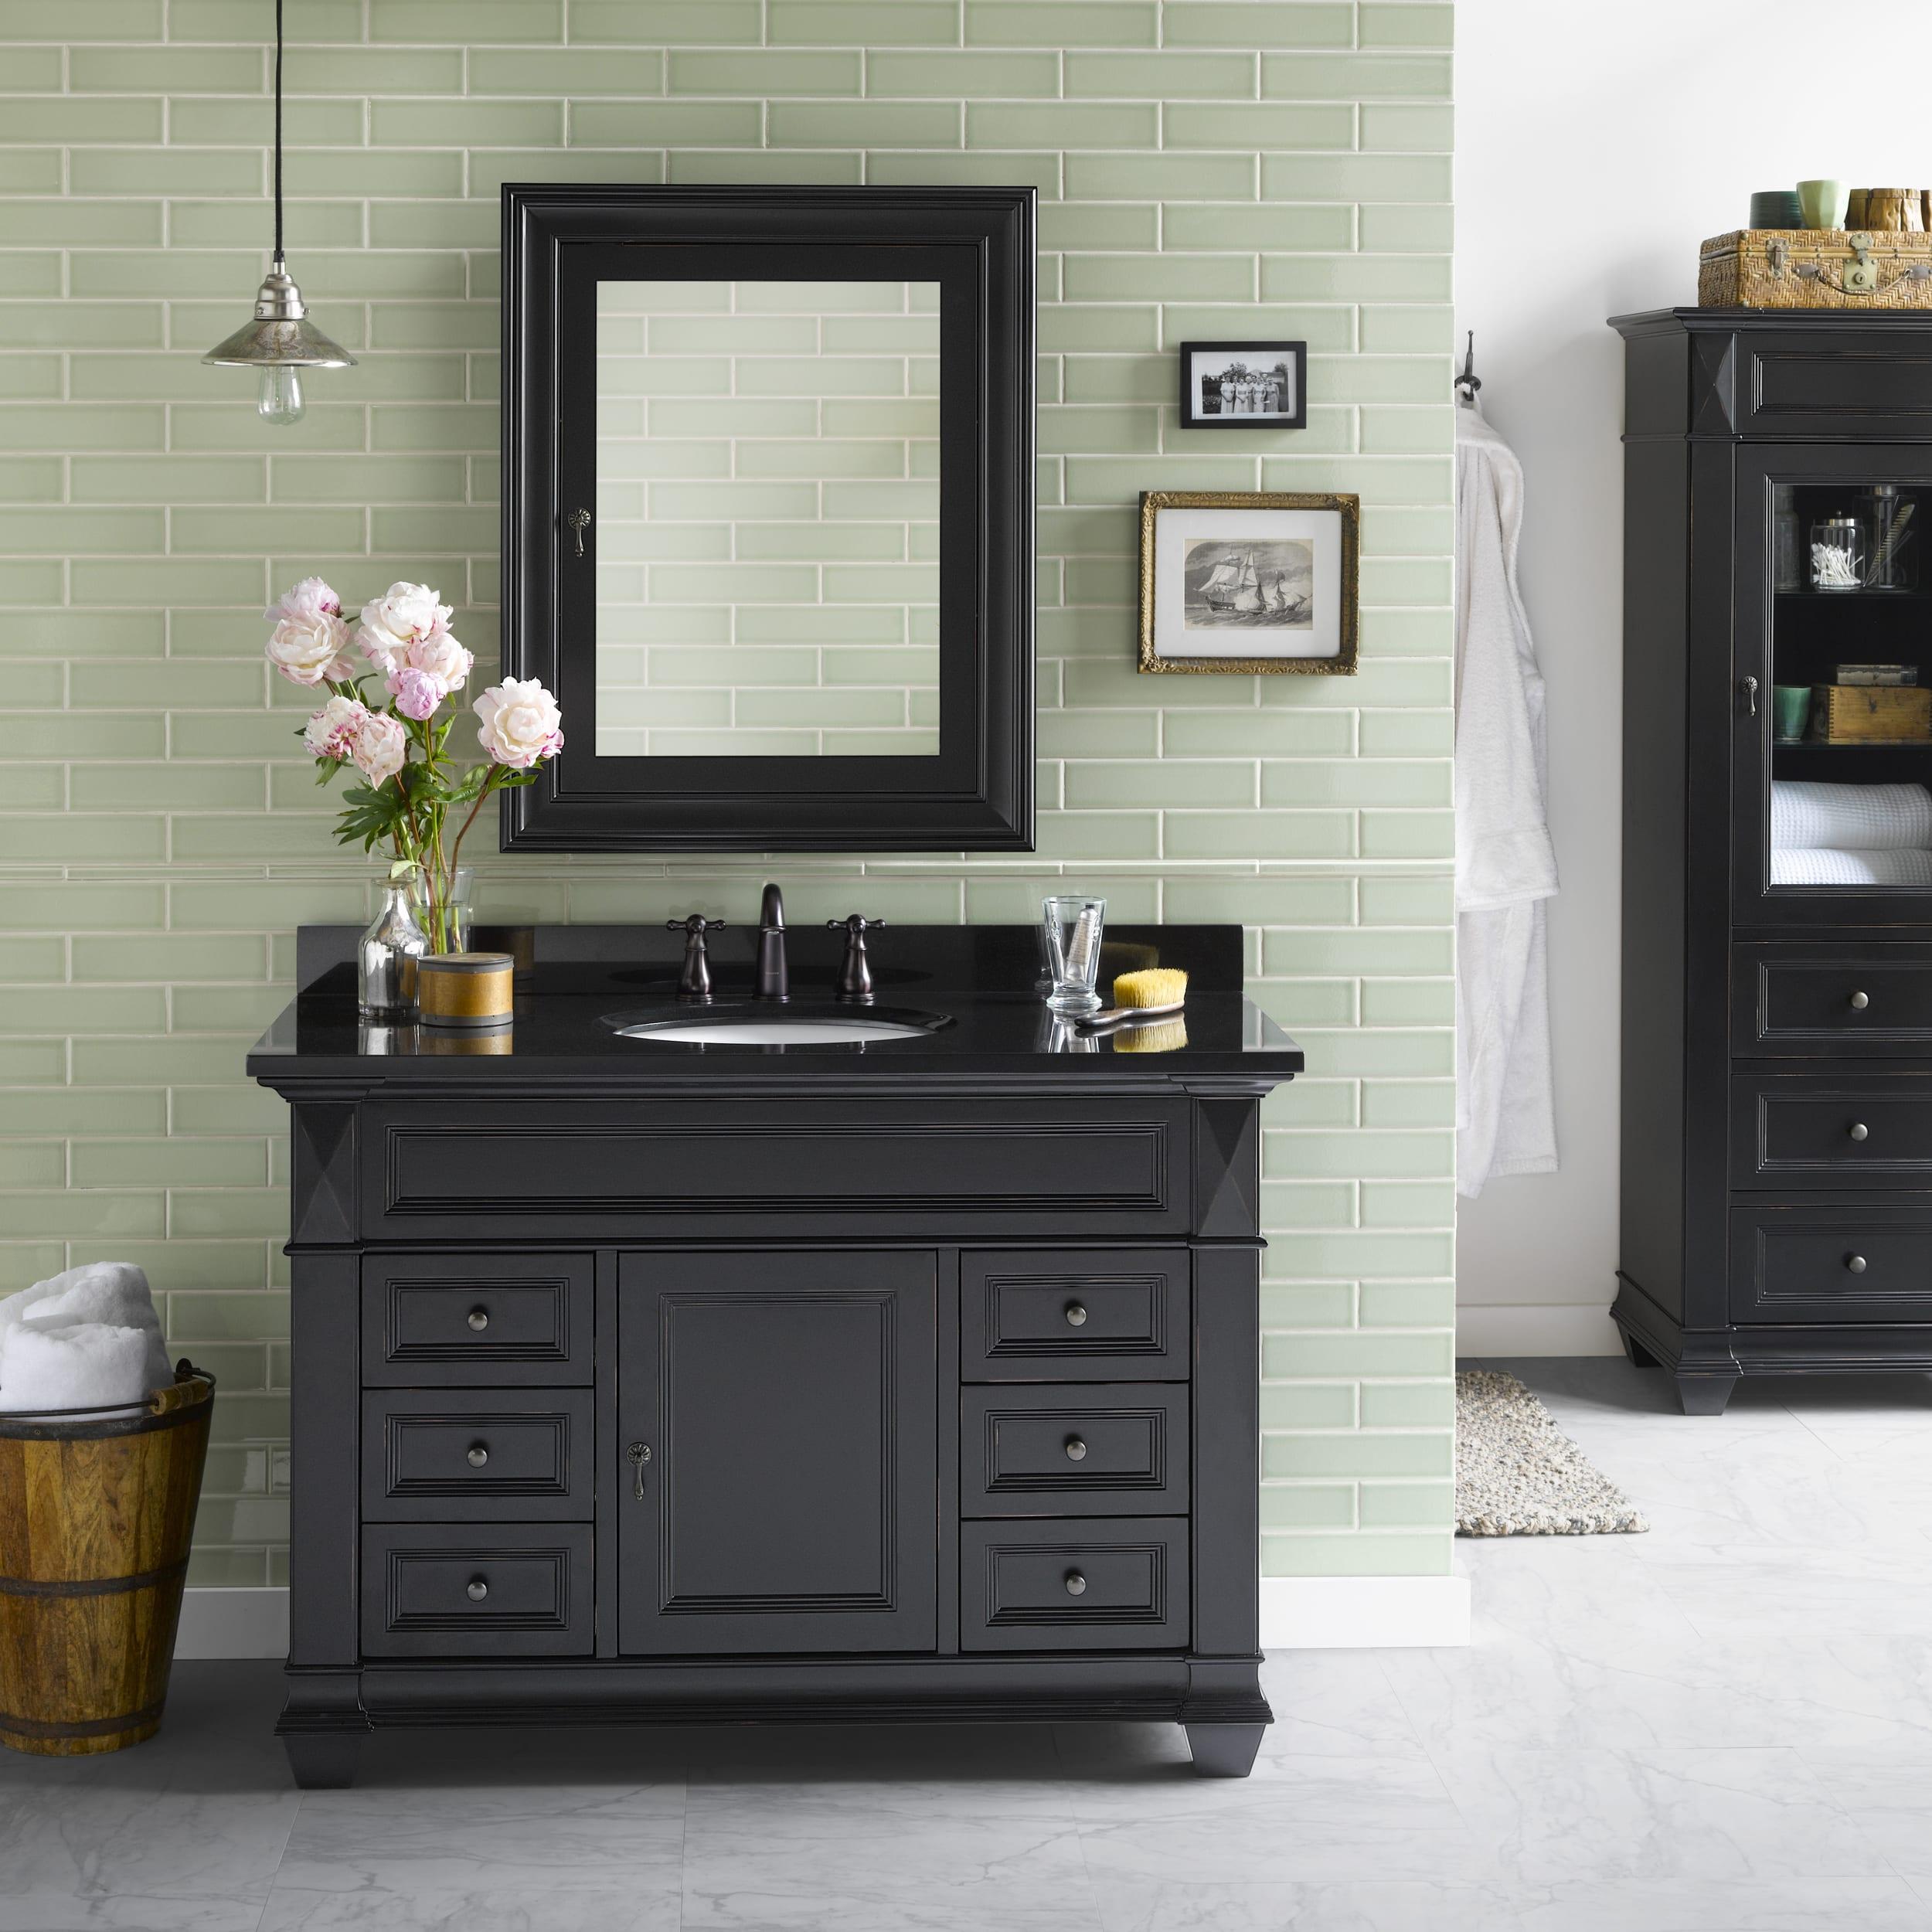 7 diy practical and decorative bathroom ideas.htm ronbow 062848 torino 48  vanity qualitybath com  ronbow 062848 torino 48  vanity